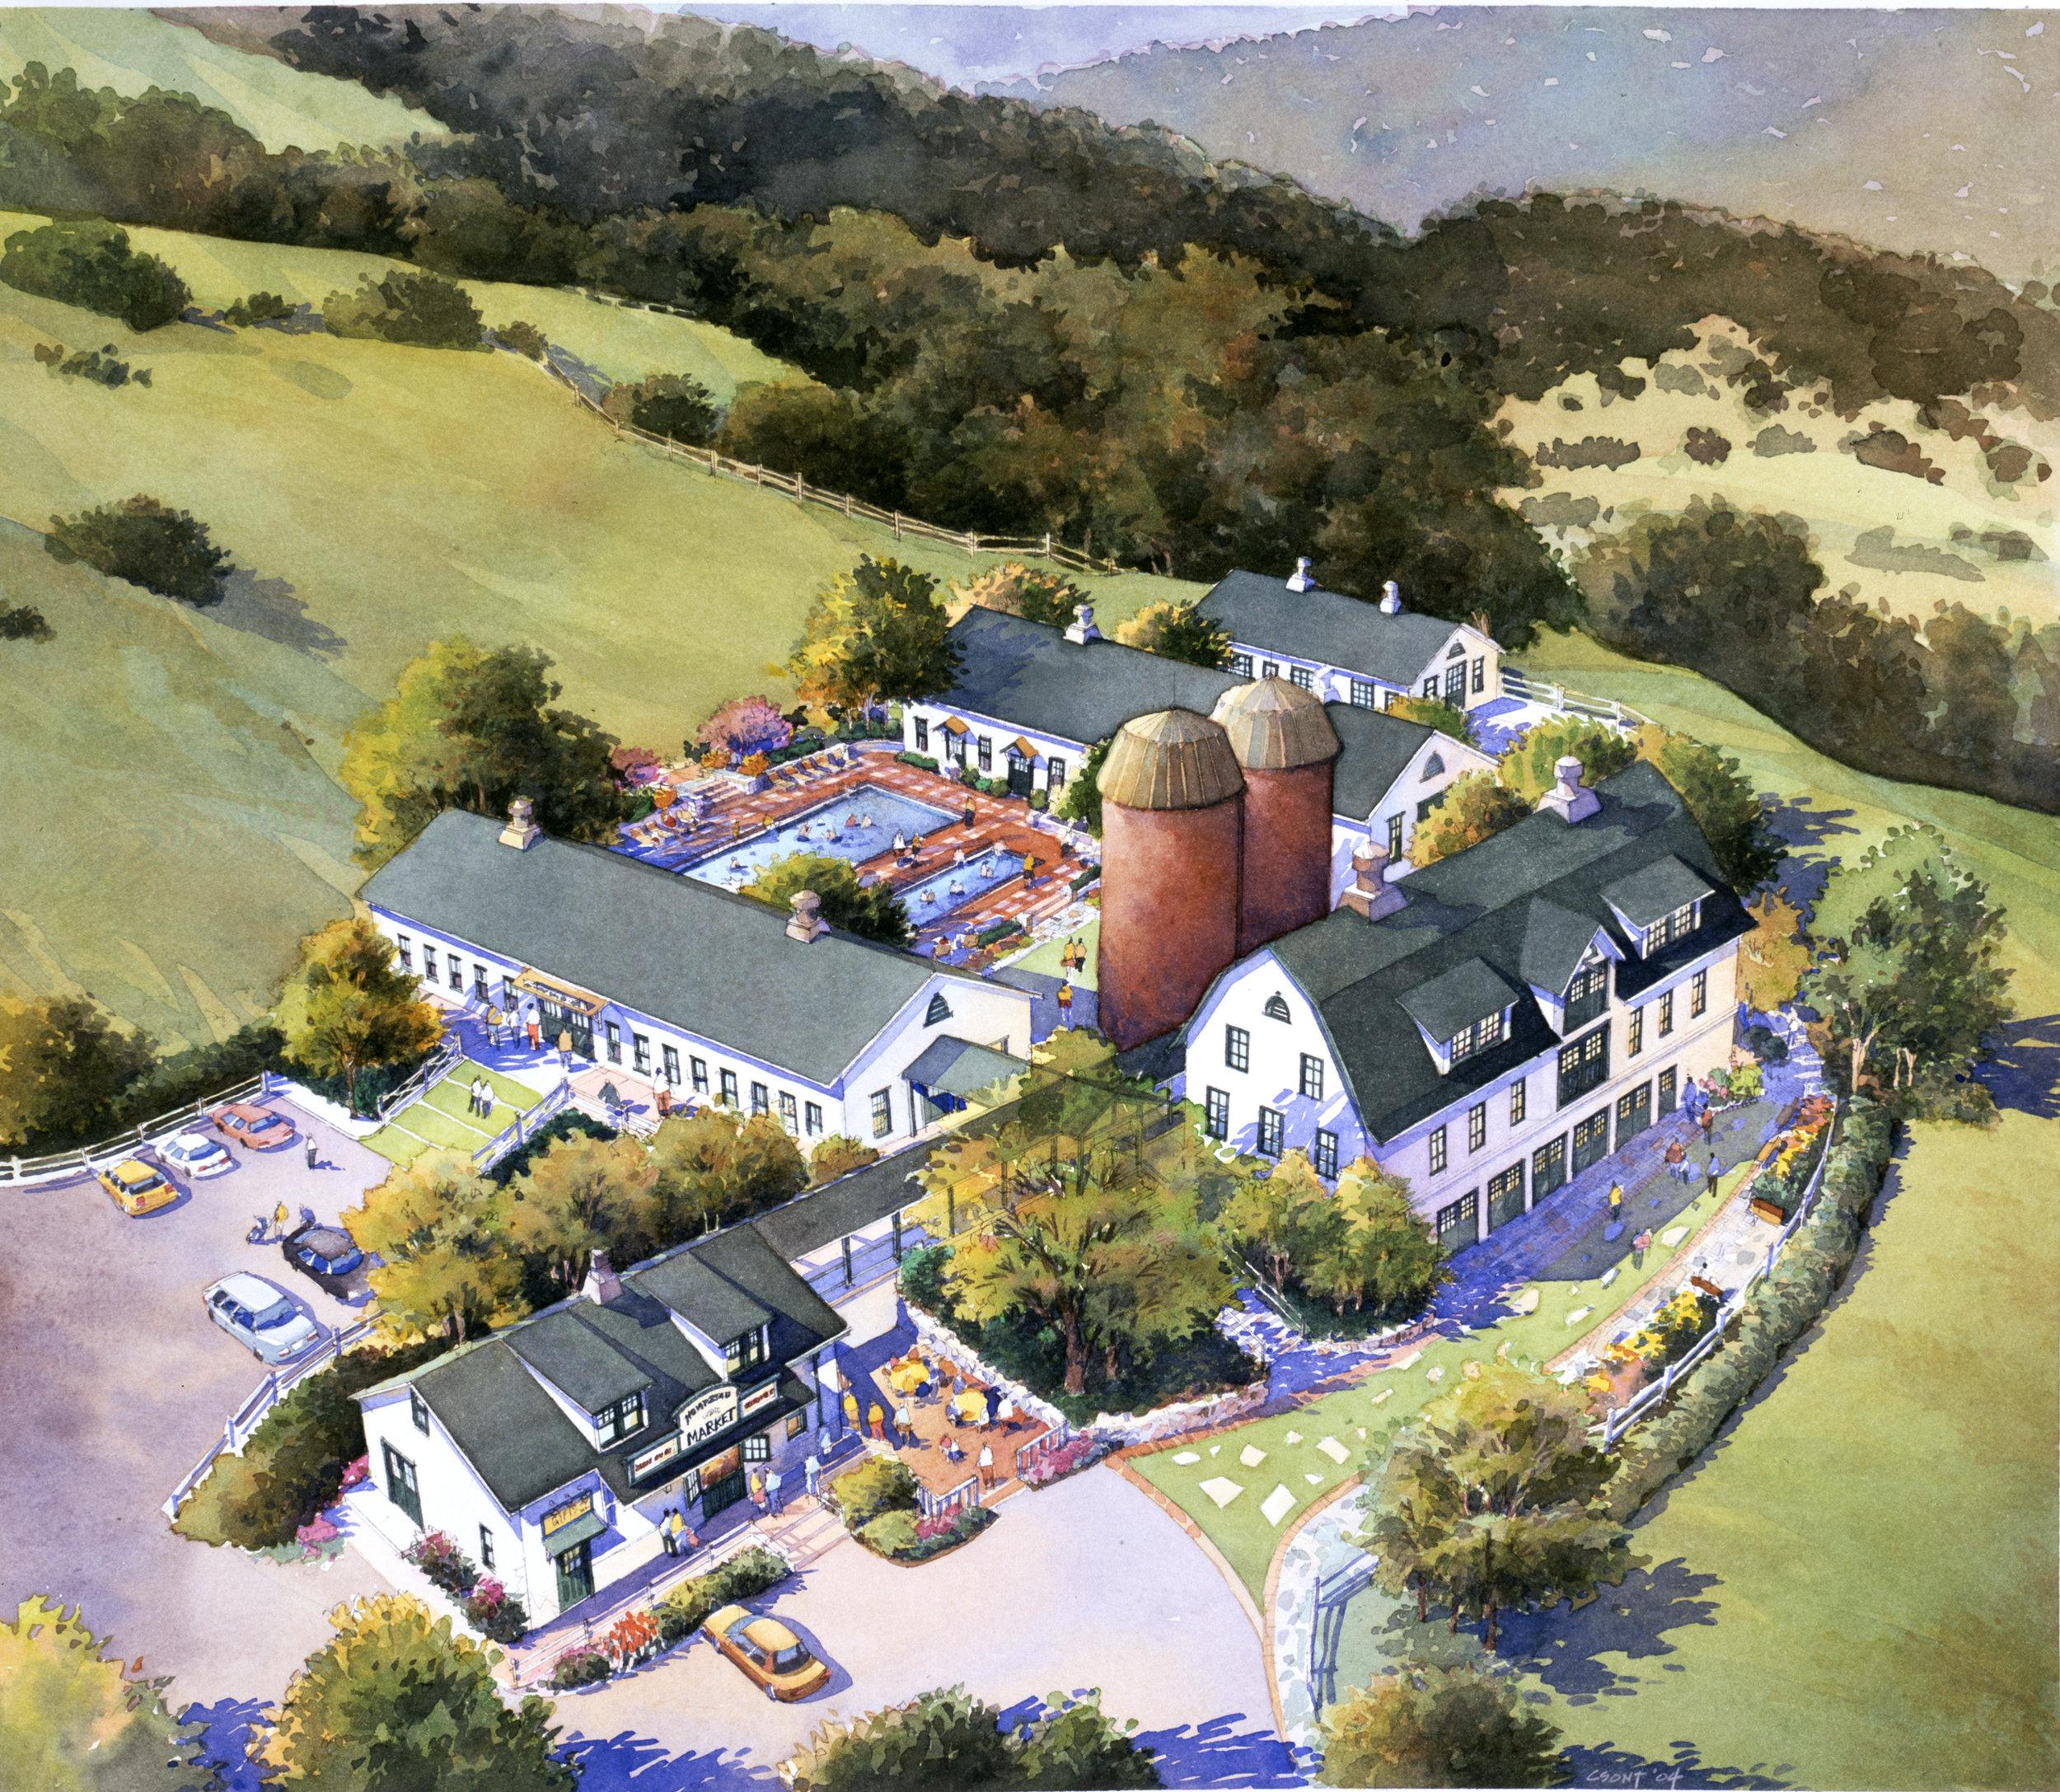 Homestead Preserve Old Dairy Community Center